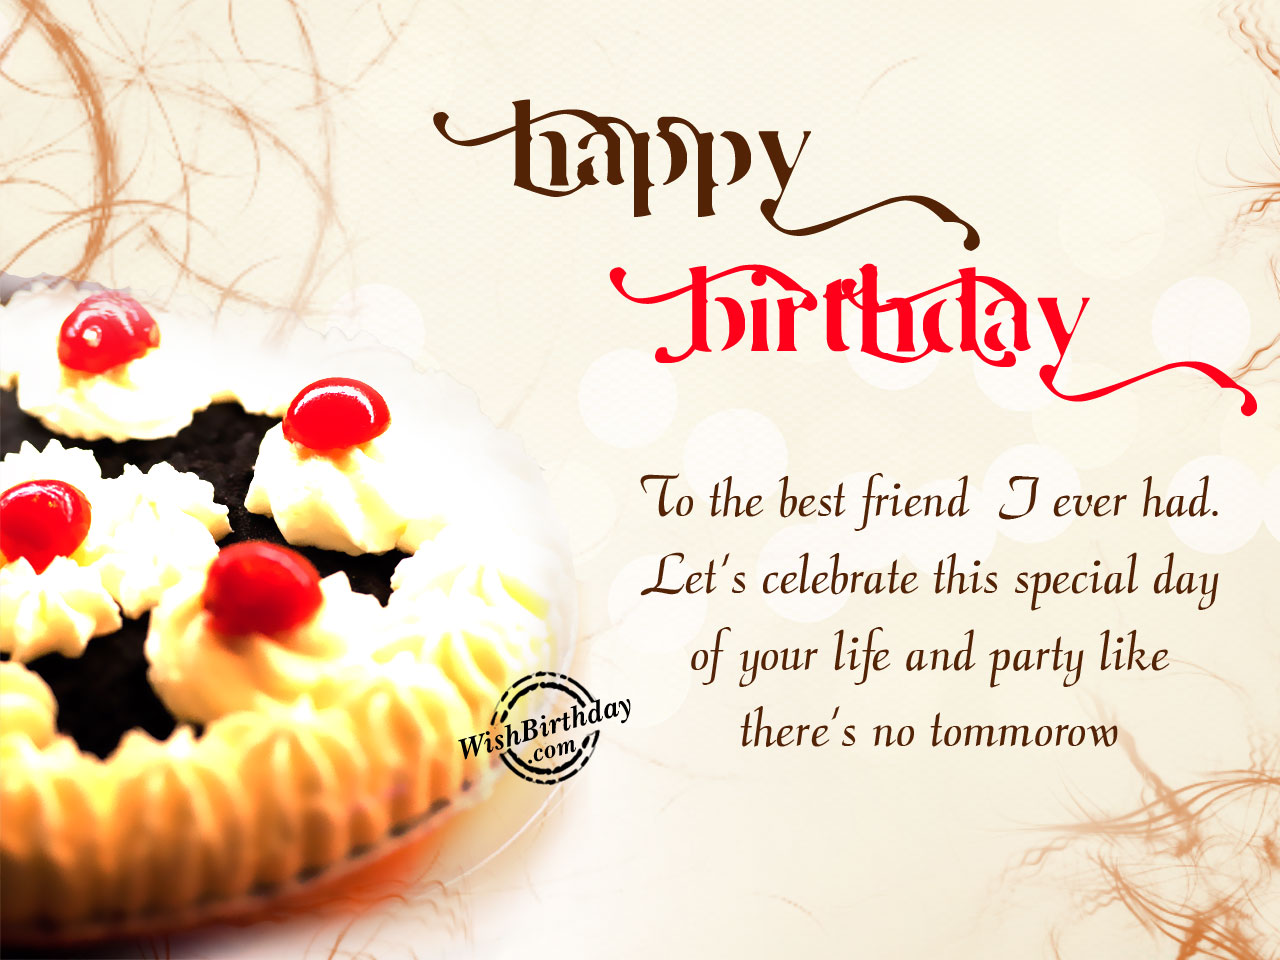 live laugh love happy birthday my dear friend